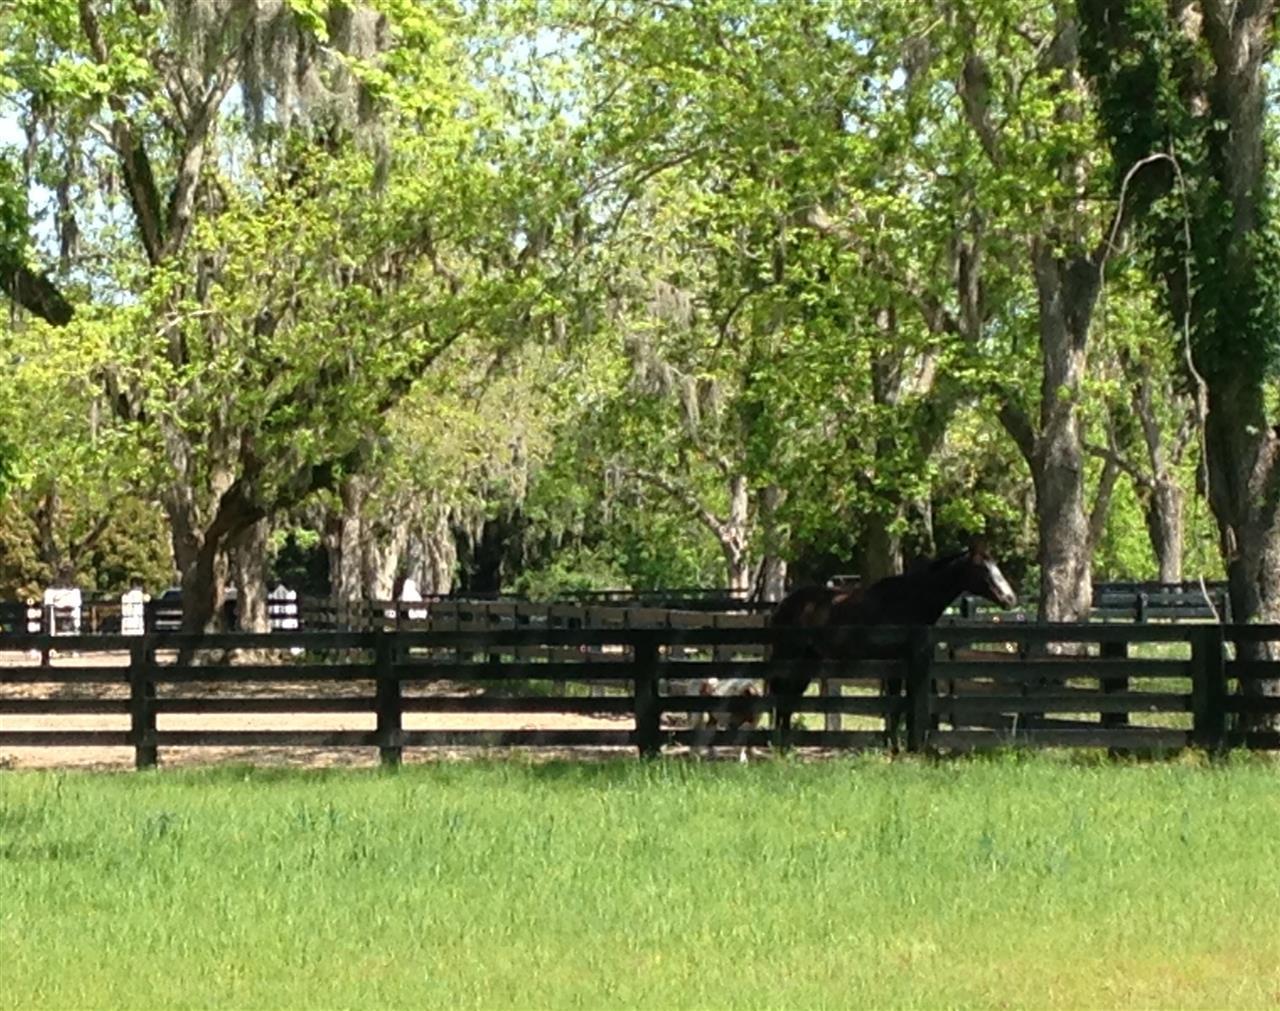 Equestrian center at Moss Creek Hilton Head Island, SC